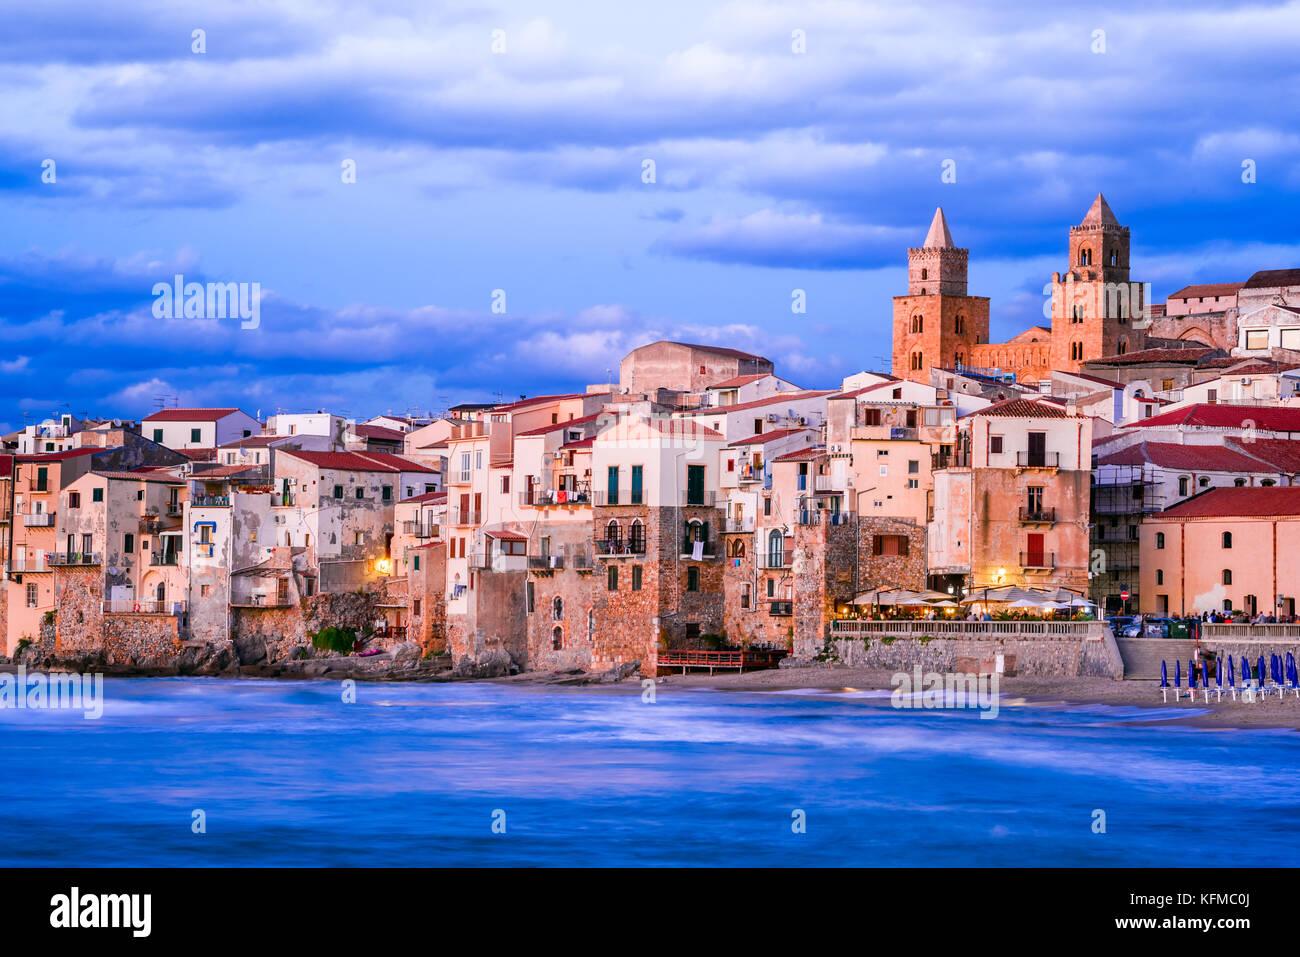 Cefalu, Sicily. Ligurian Sea and medieval sicilian city Cefalu. Province of Palermo, Italy. - Stock Image